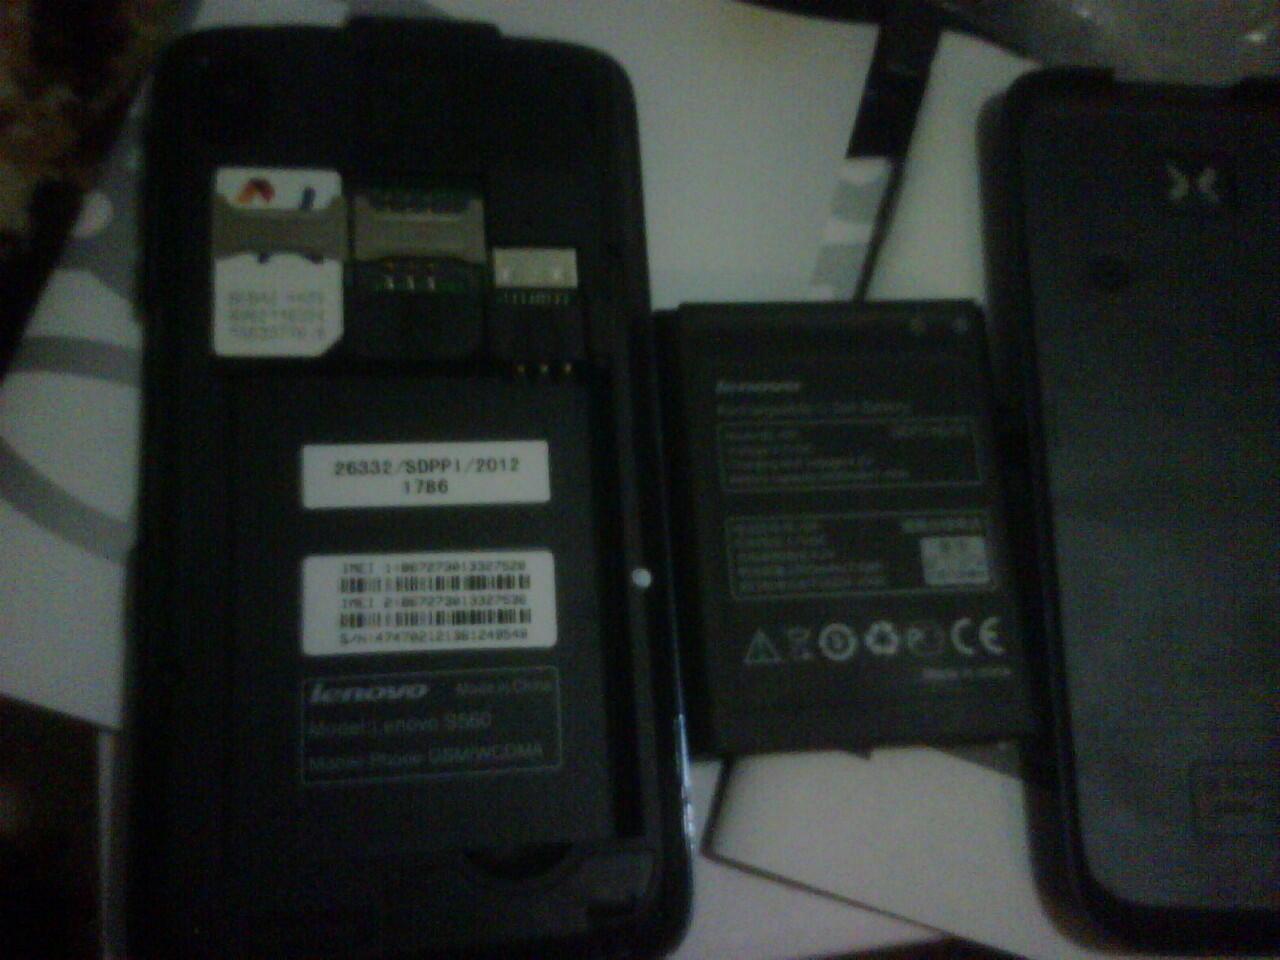 Lenovo S560 1,4jt Nego sampe jadi, depok